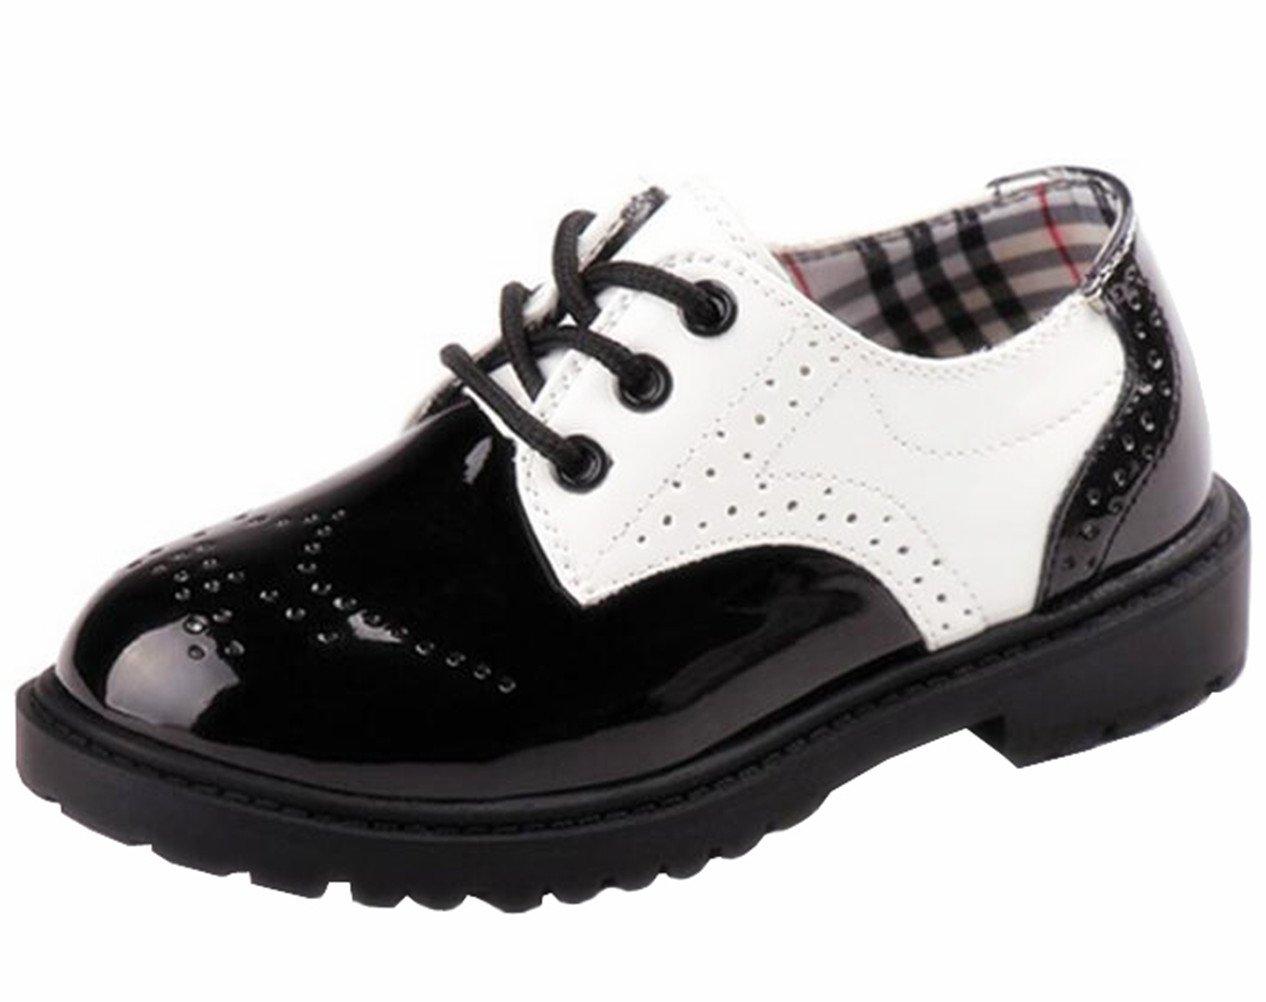 DADAWEN Children's Boy's Girl's Oxford Dress Shoe (Toddler/Little Kid/Big Kid) Black and White US Size 5.5 M Toddler